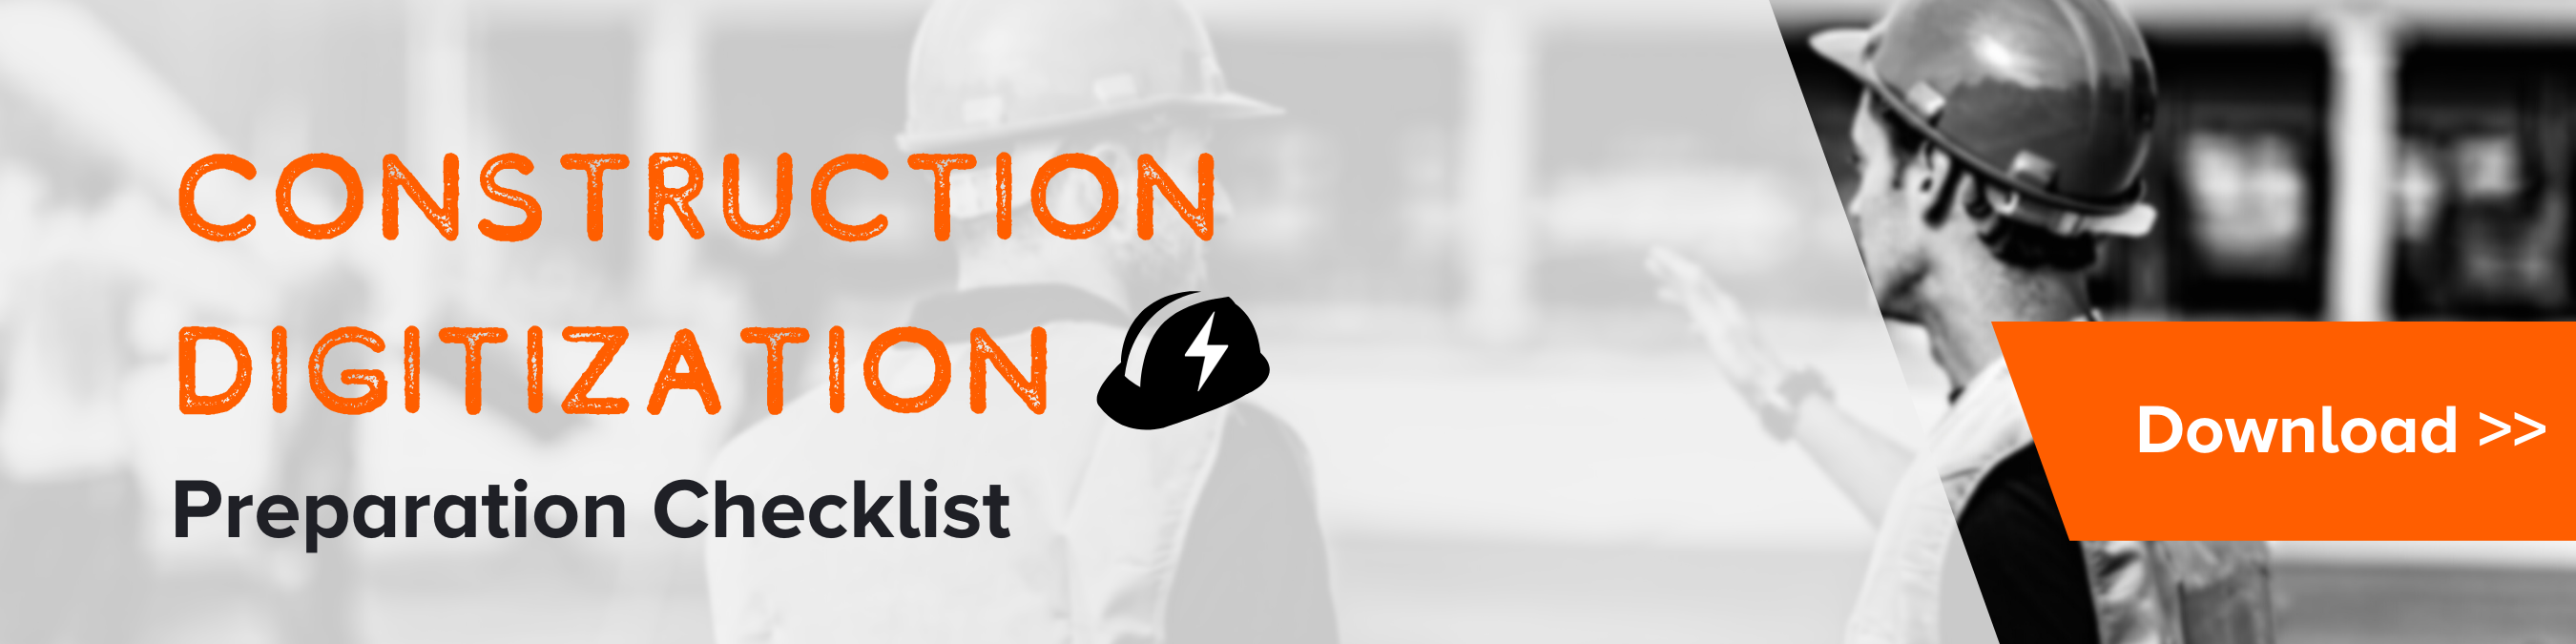 Construction Digitization Preparation Checklost